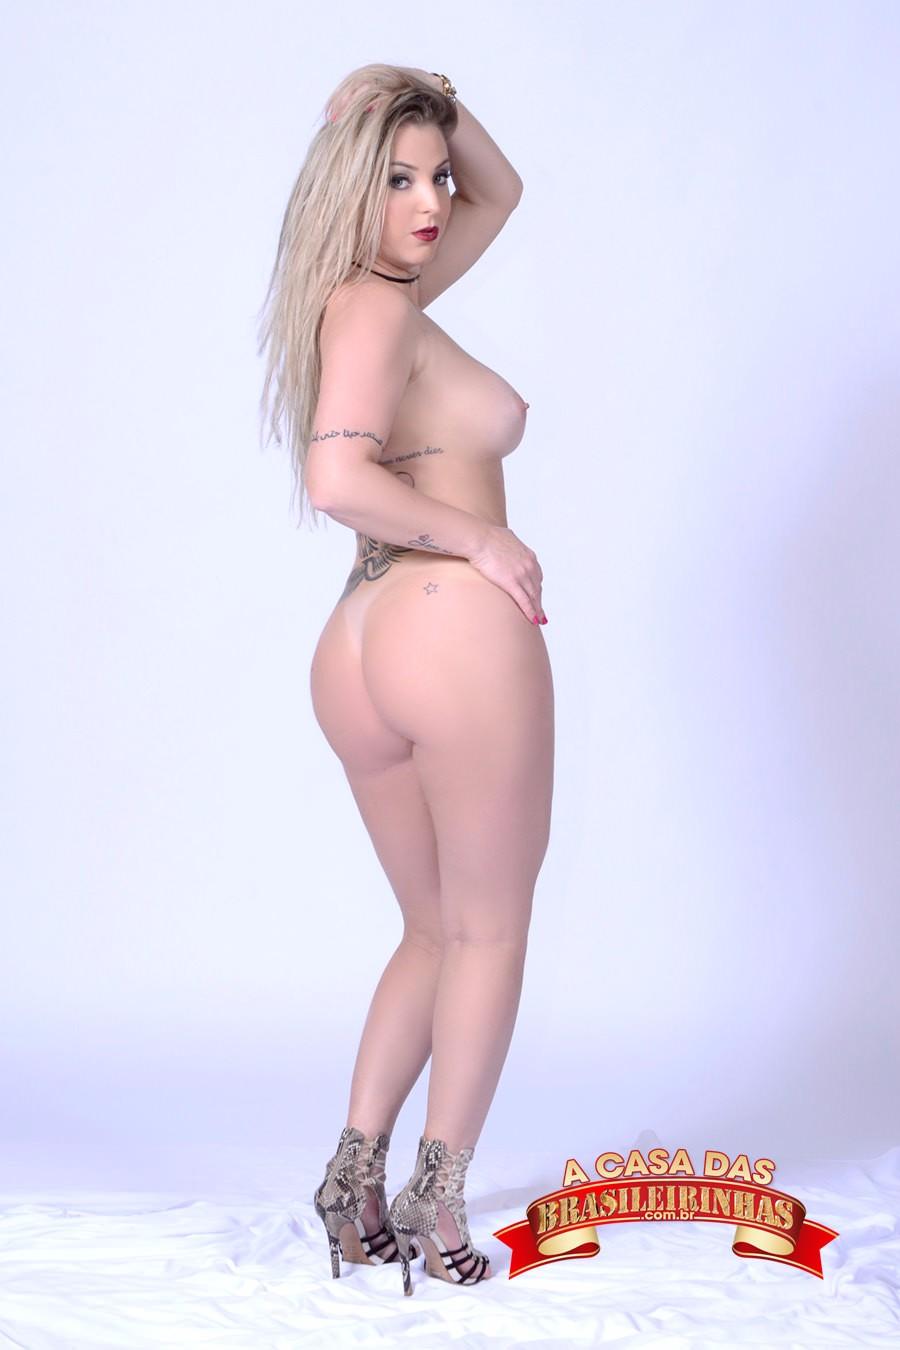 Milena santos filme porno this woman!